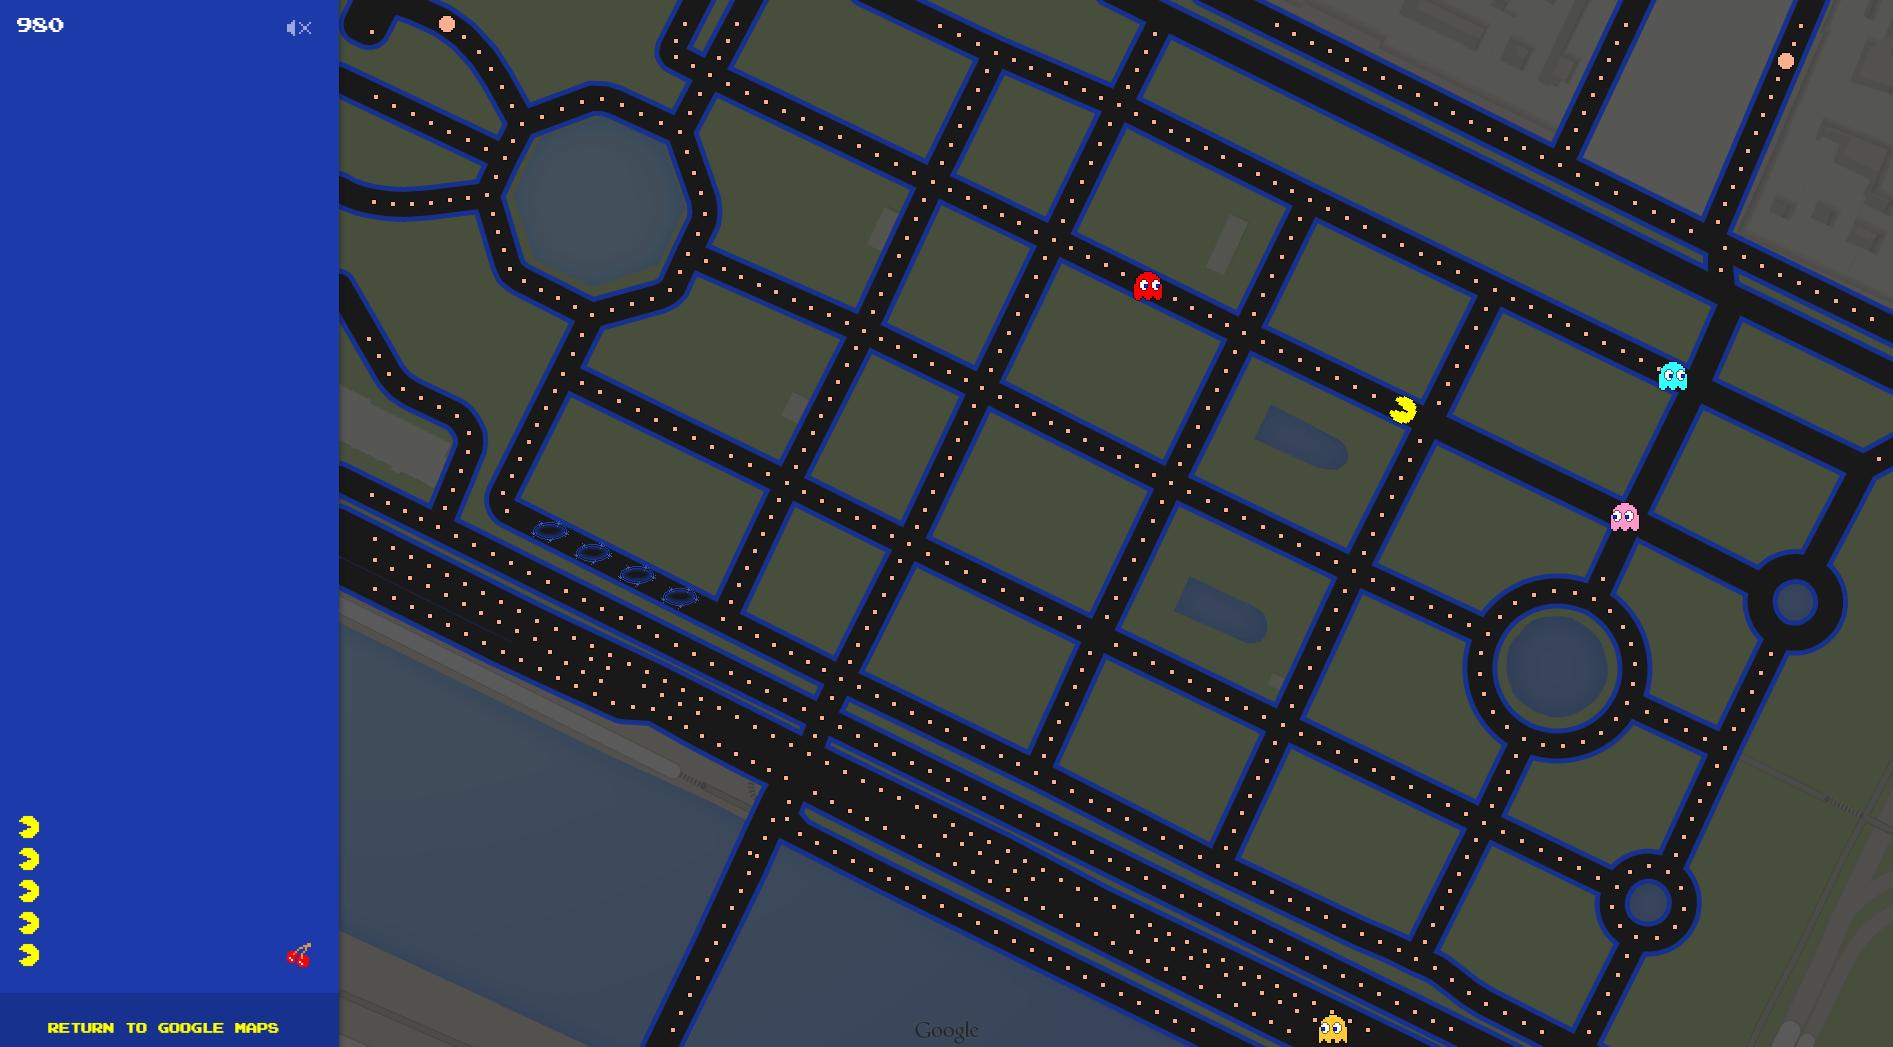 Google Maps transforme vos rues en jeu de Pacman